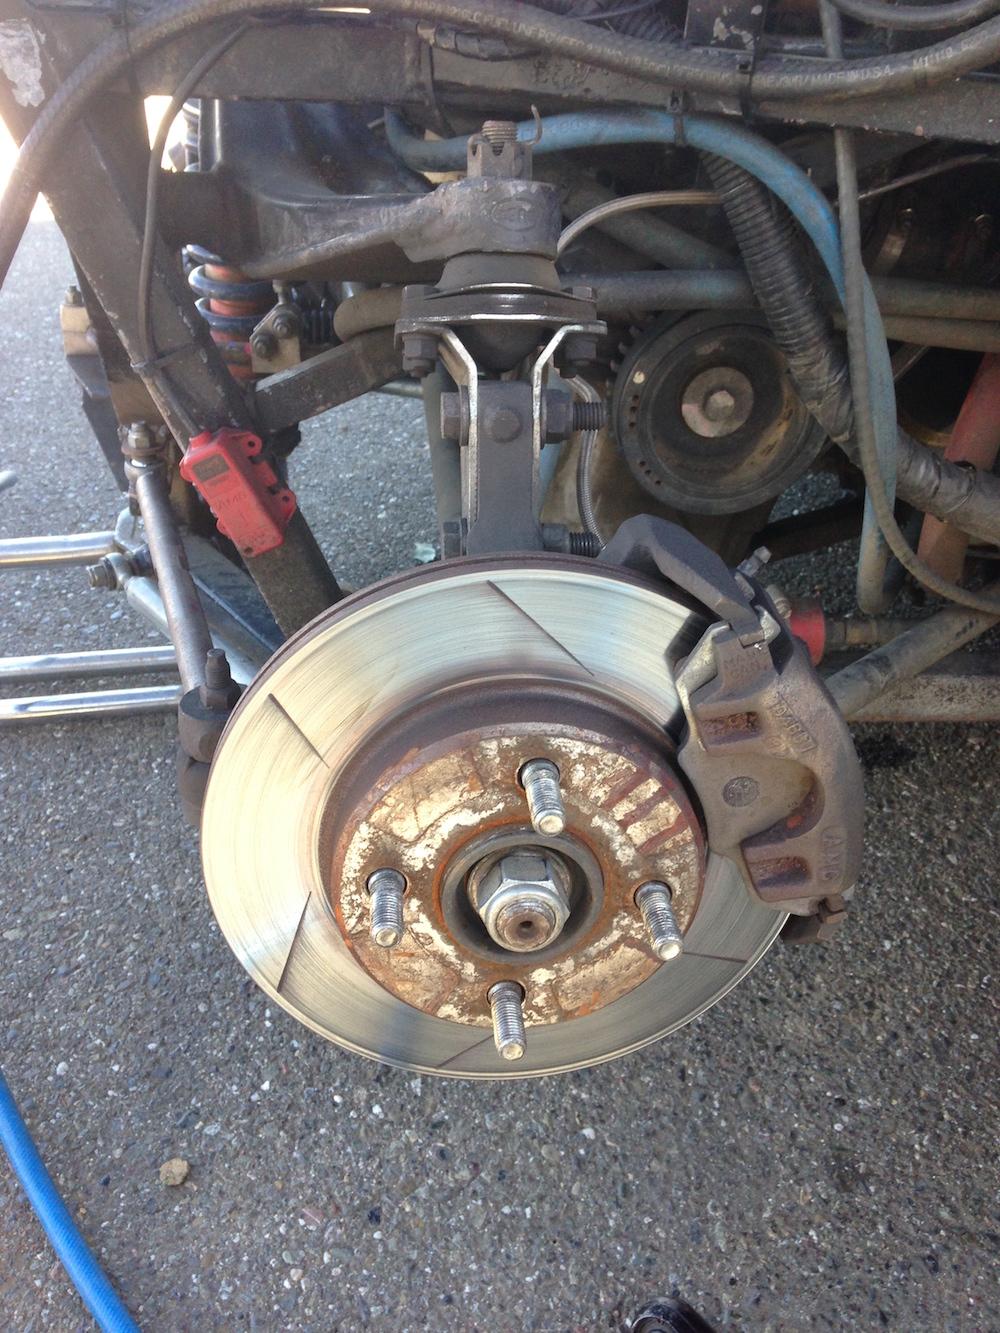 SCCA Spec Racer Ford Brakes.JPG